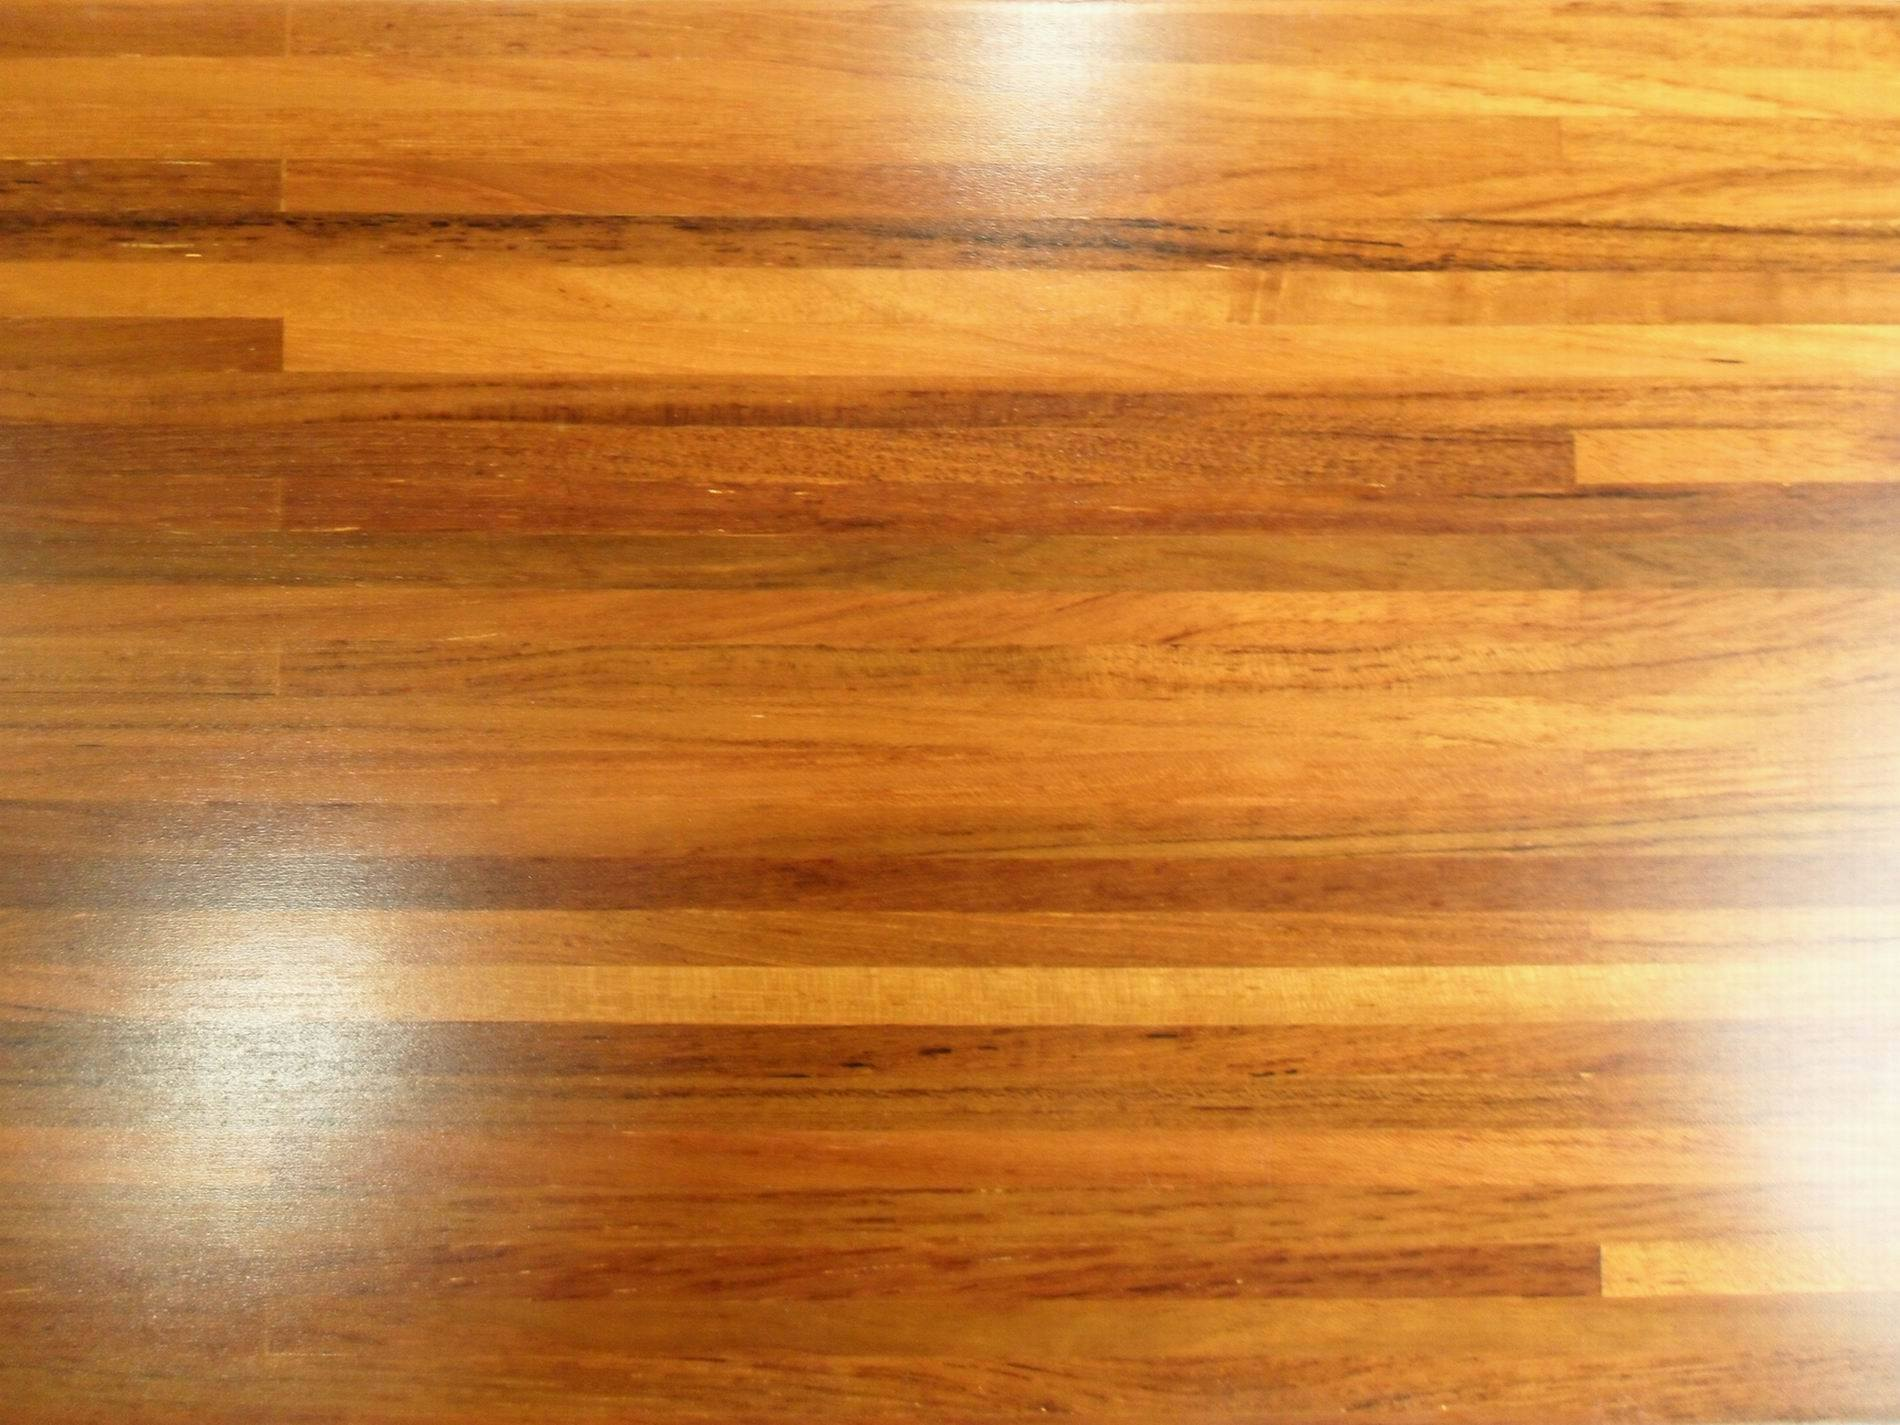 Plancher machin par teck bt e i plancher machin par for Teak flooring